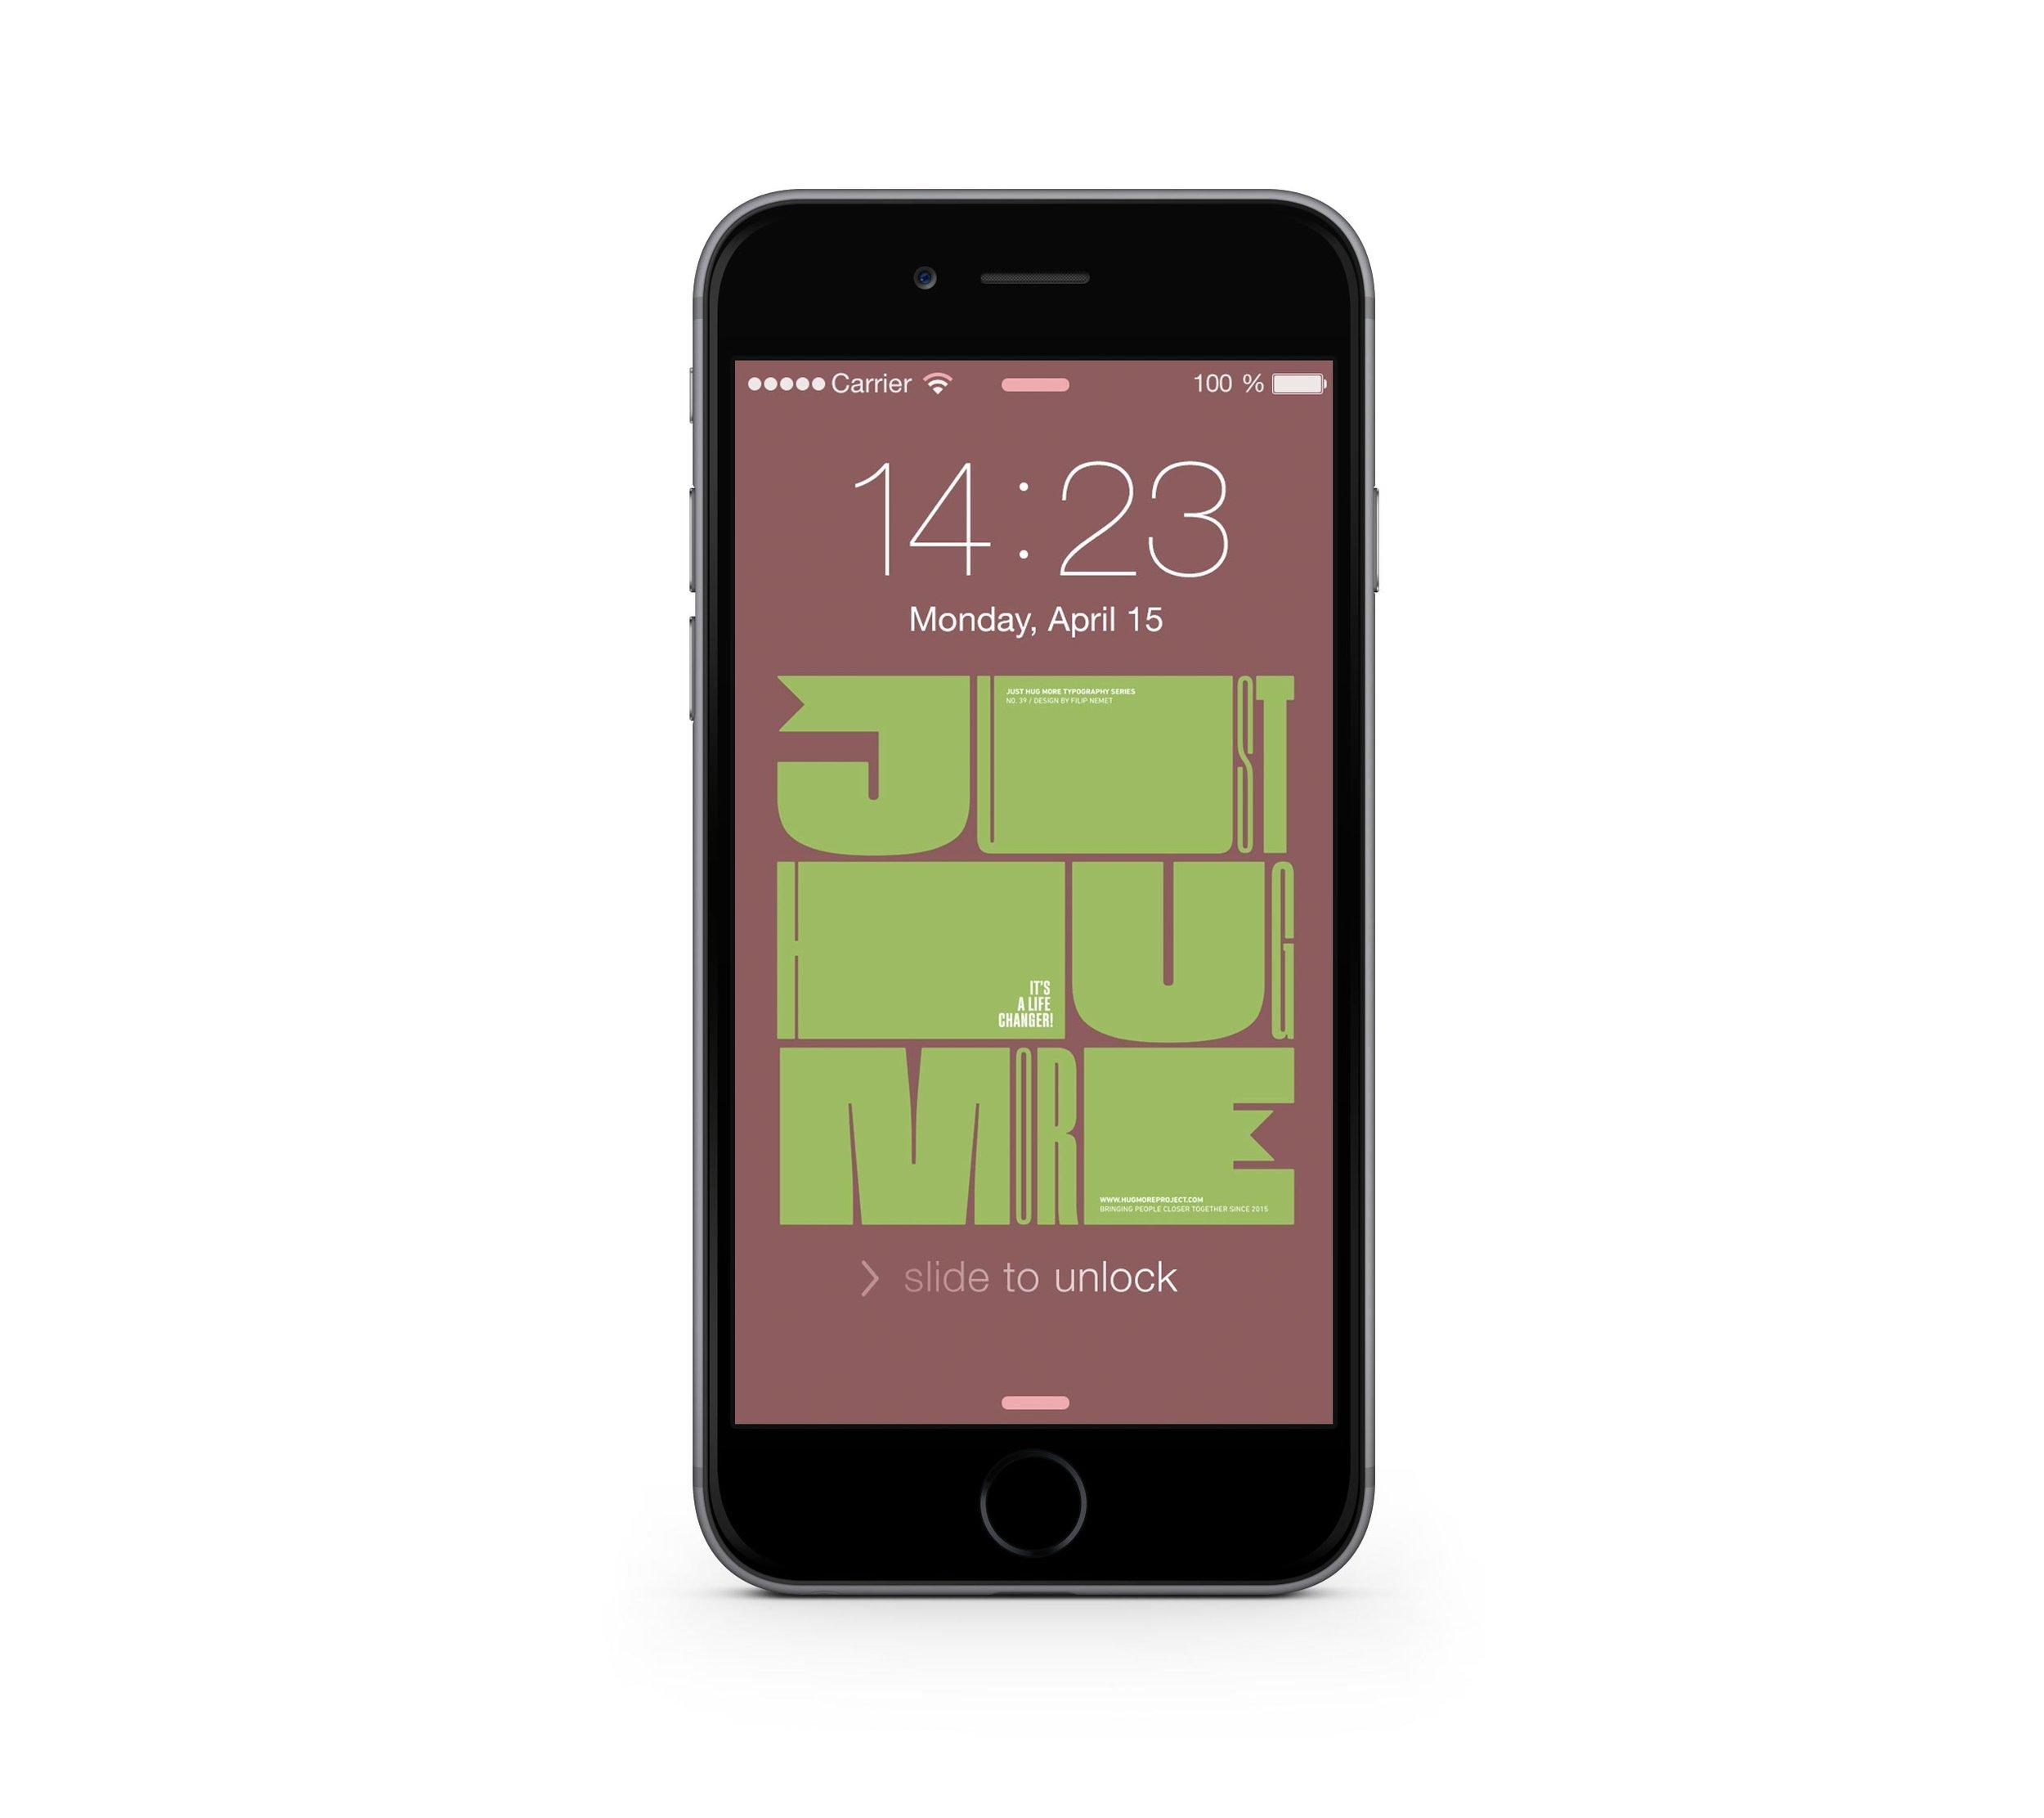 just-hug-more-typo-039-iPhone-mockup-onwhite.jpg